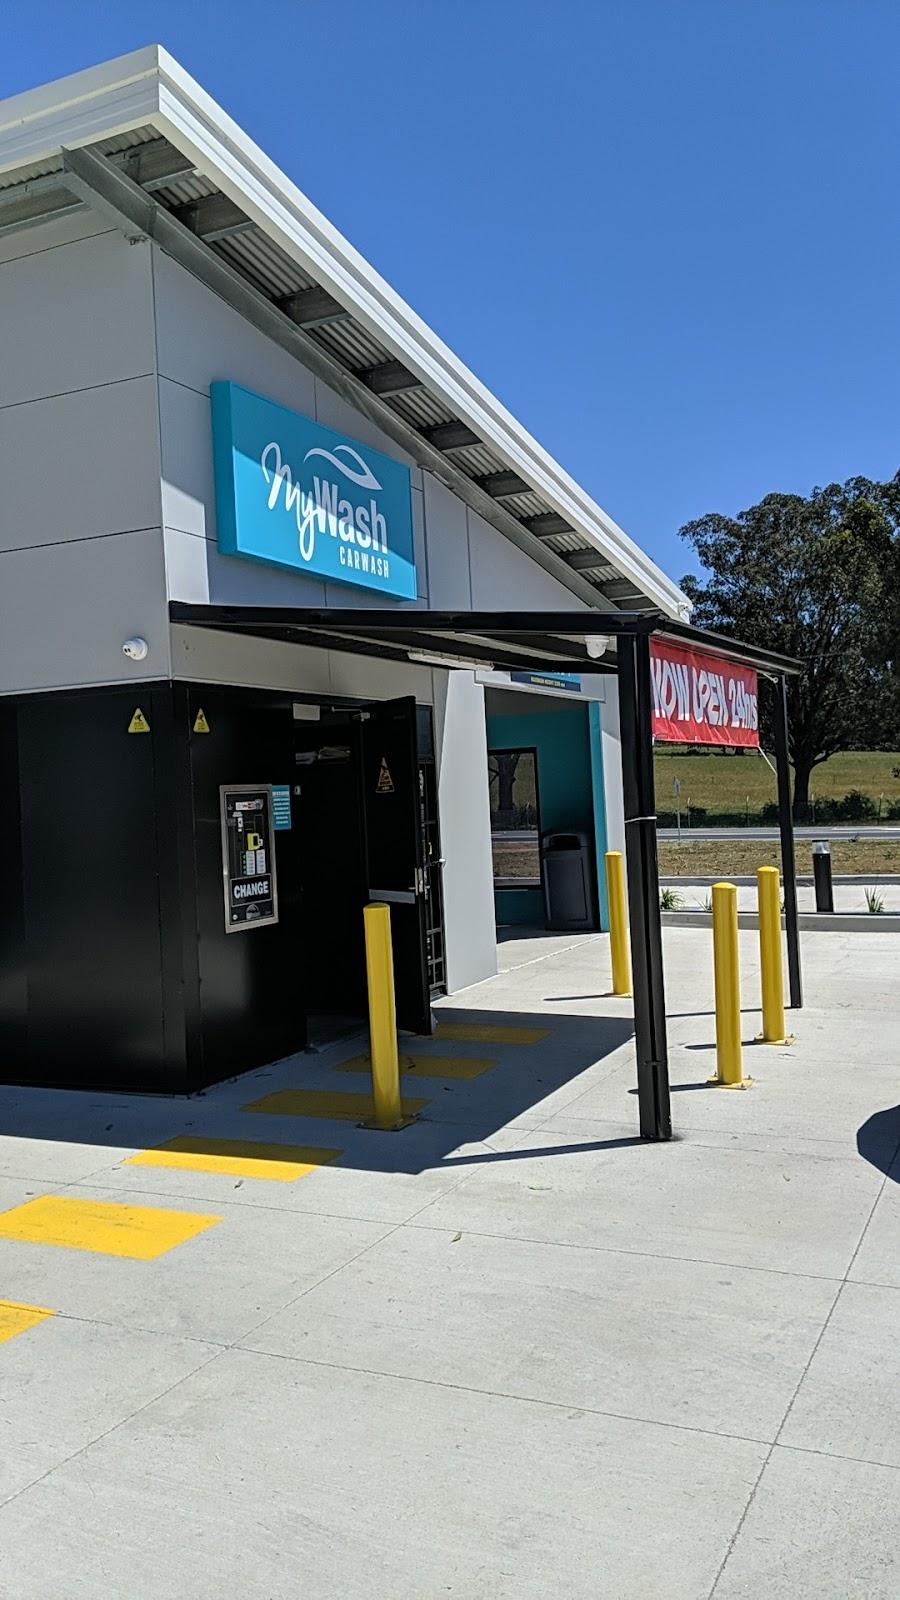 Mywash Carwash | car wash | 194 Campbelltown Rd, Denham Court NSW 2565, Australia | 0413756000 OR +61 413 756 000